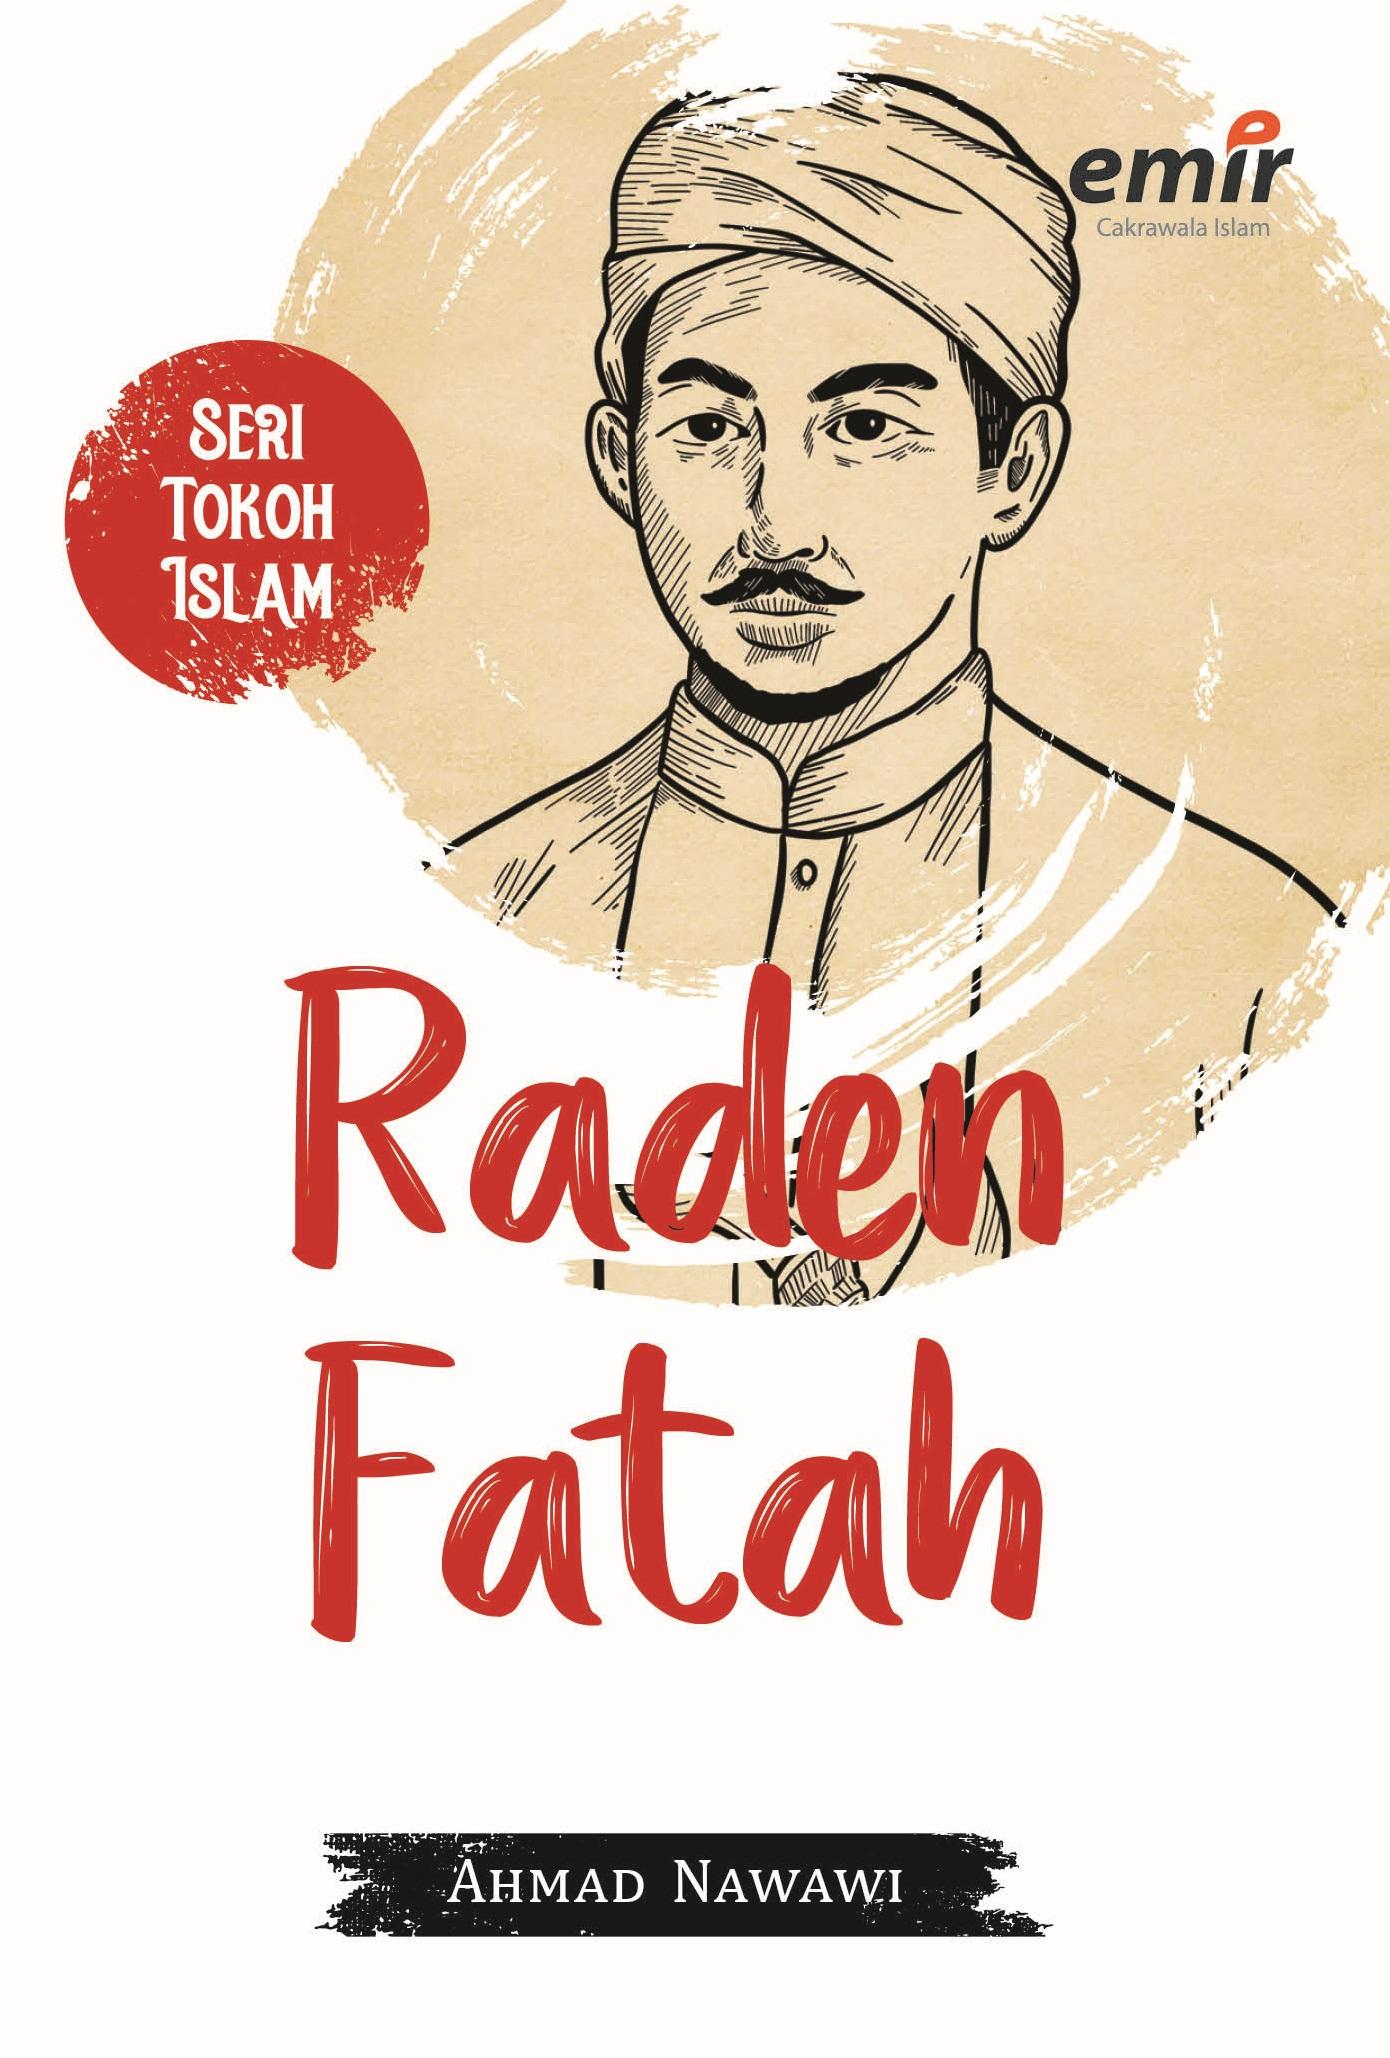 SERI TOKOH ISLAM: RADEN FATAH